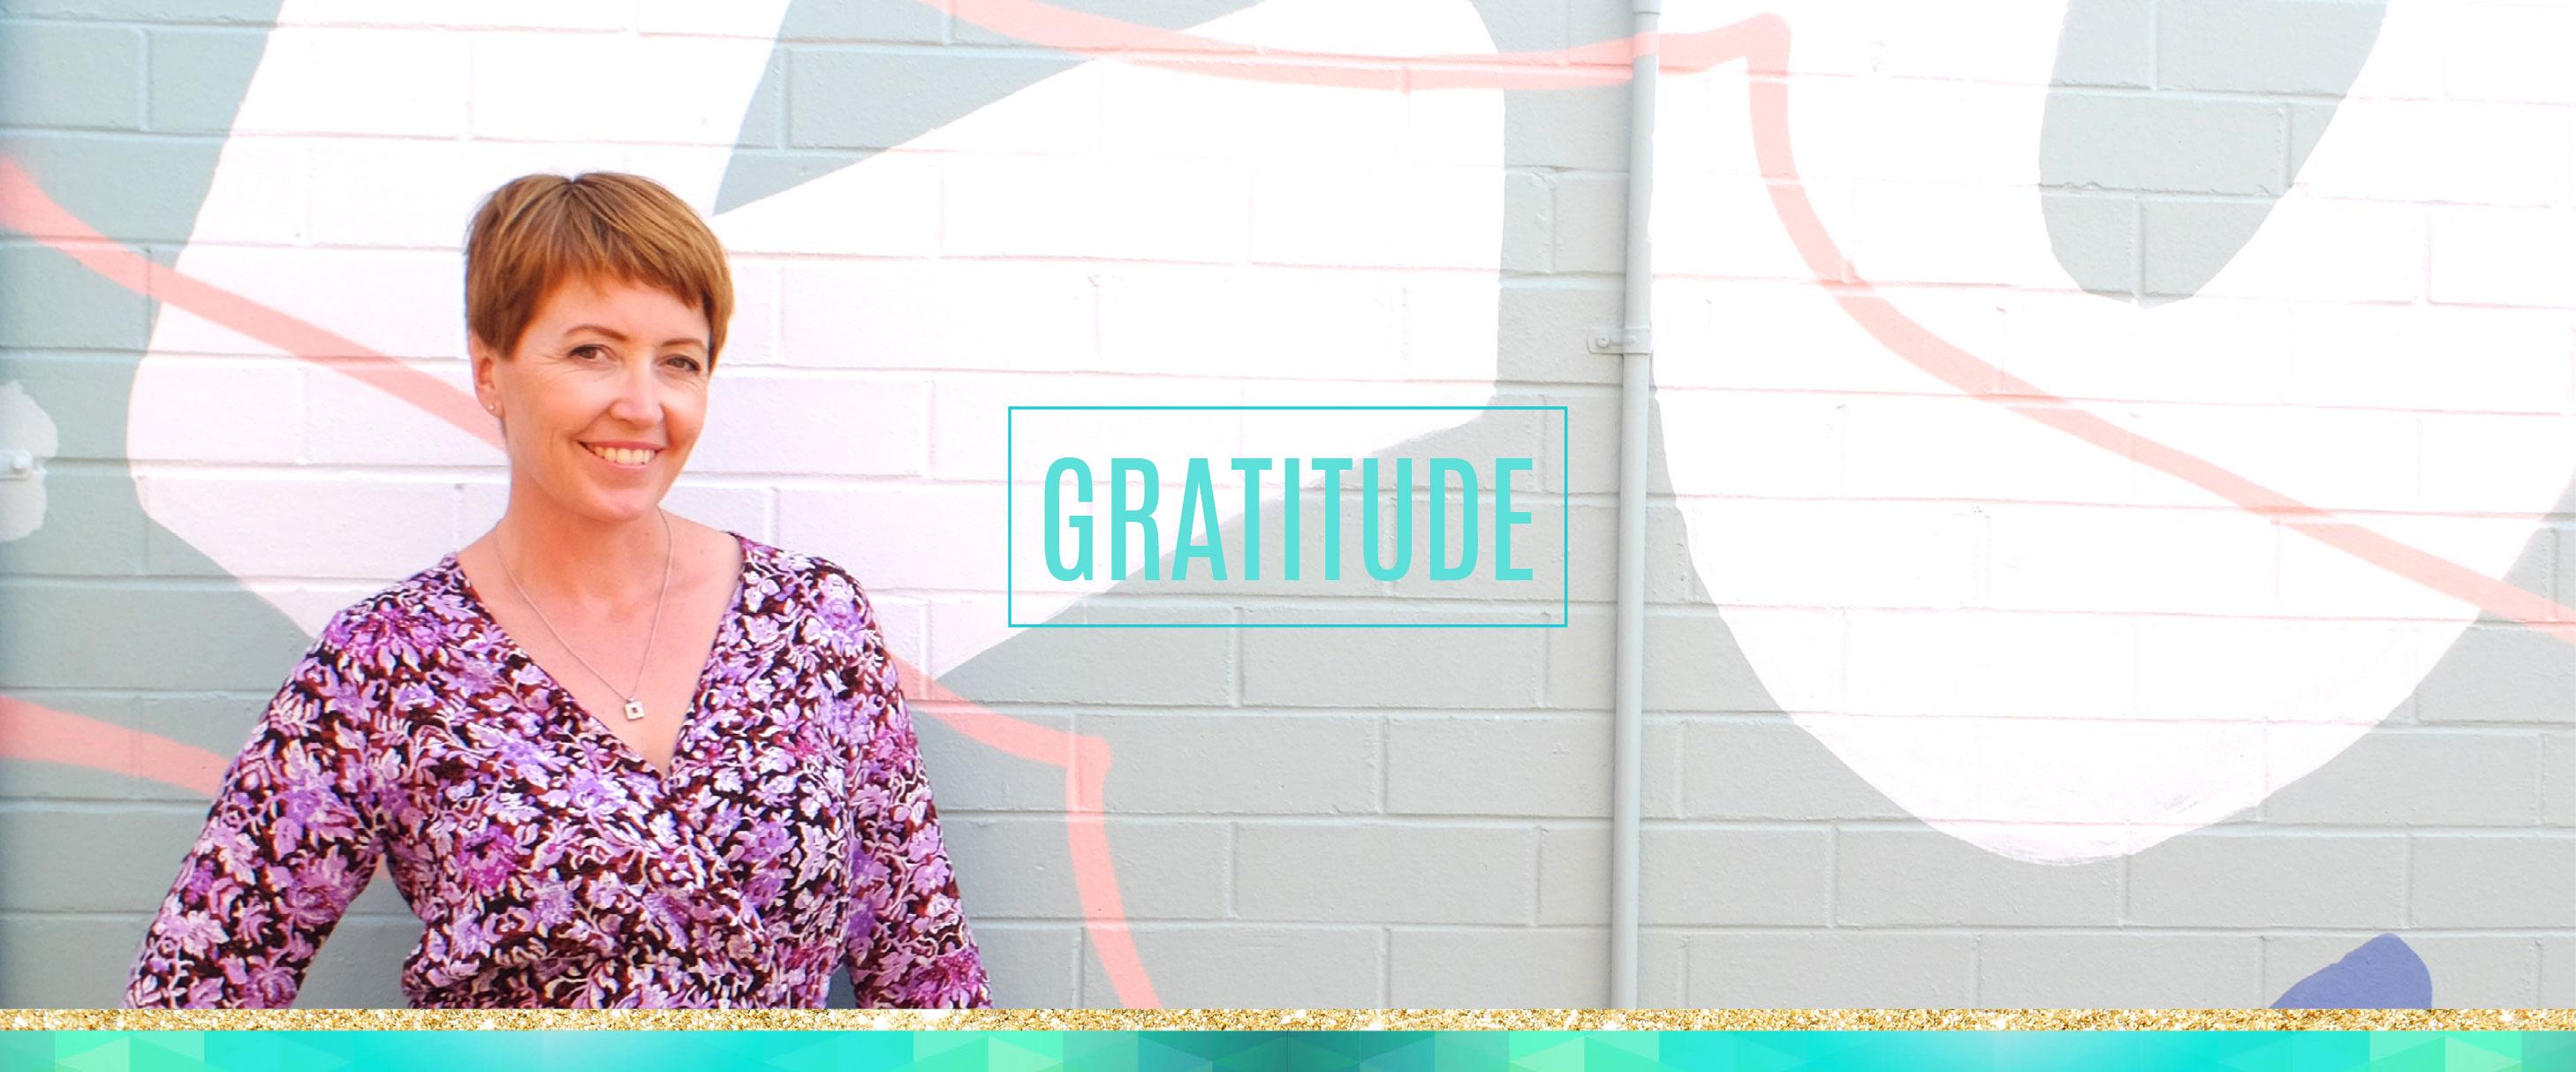 gratitude-banner